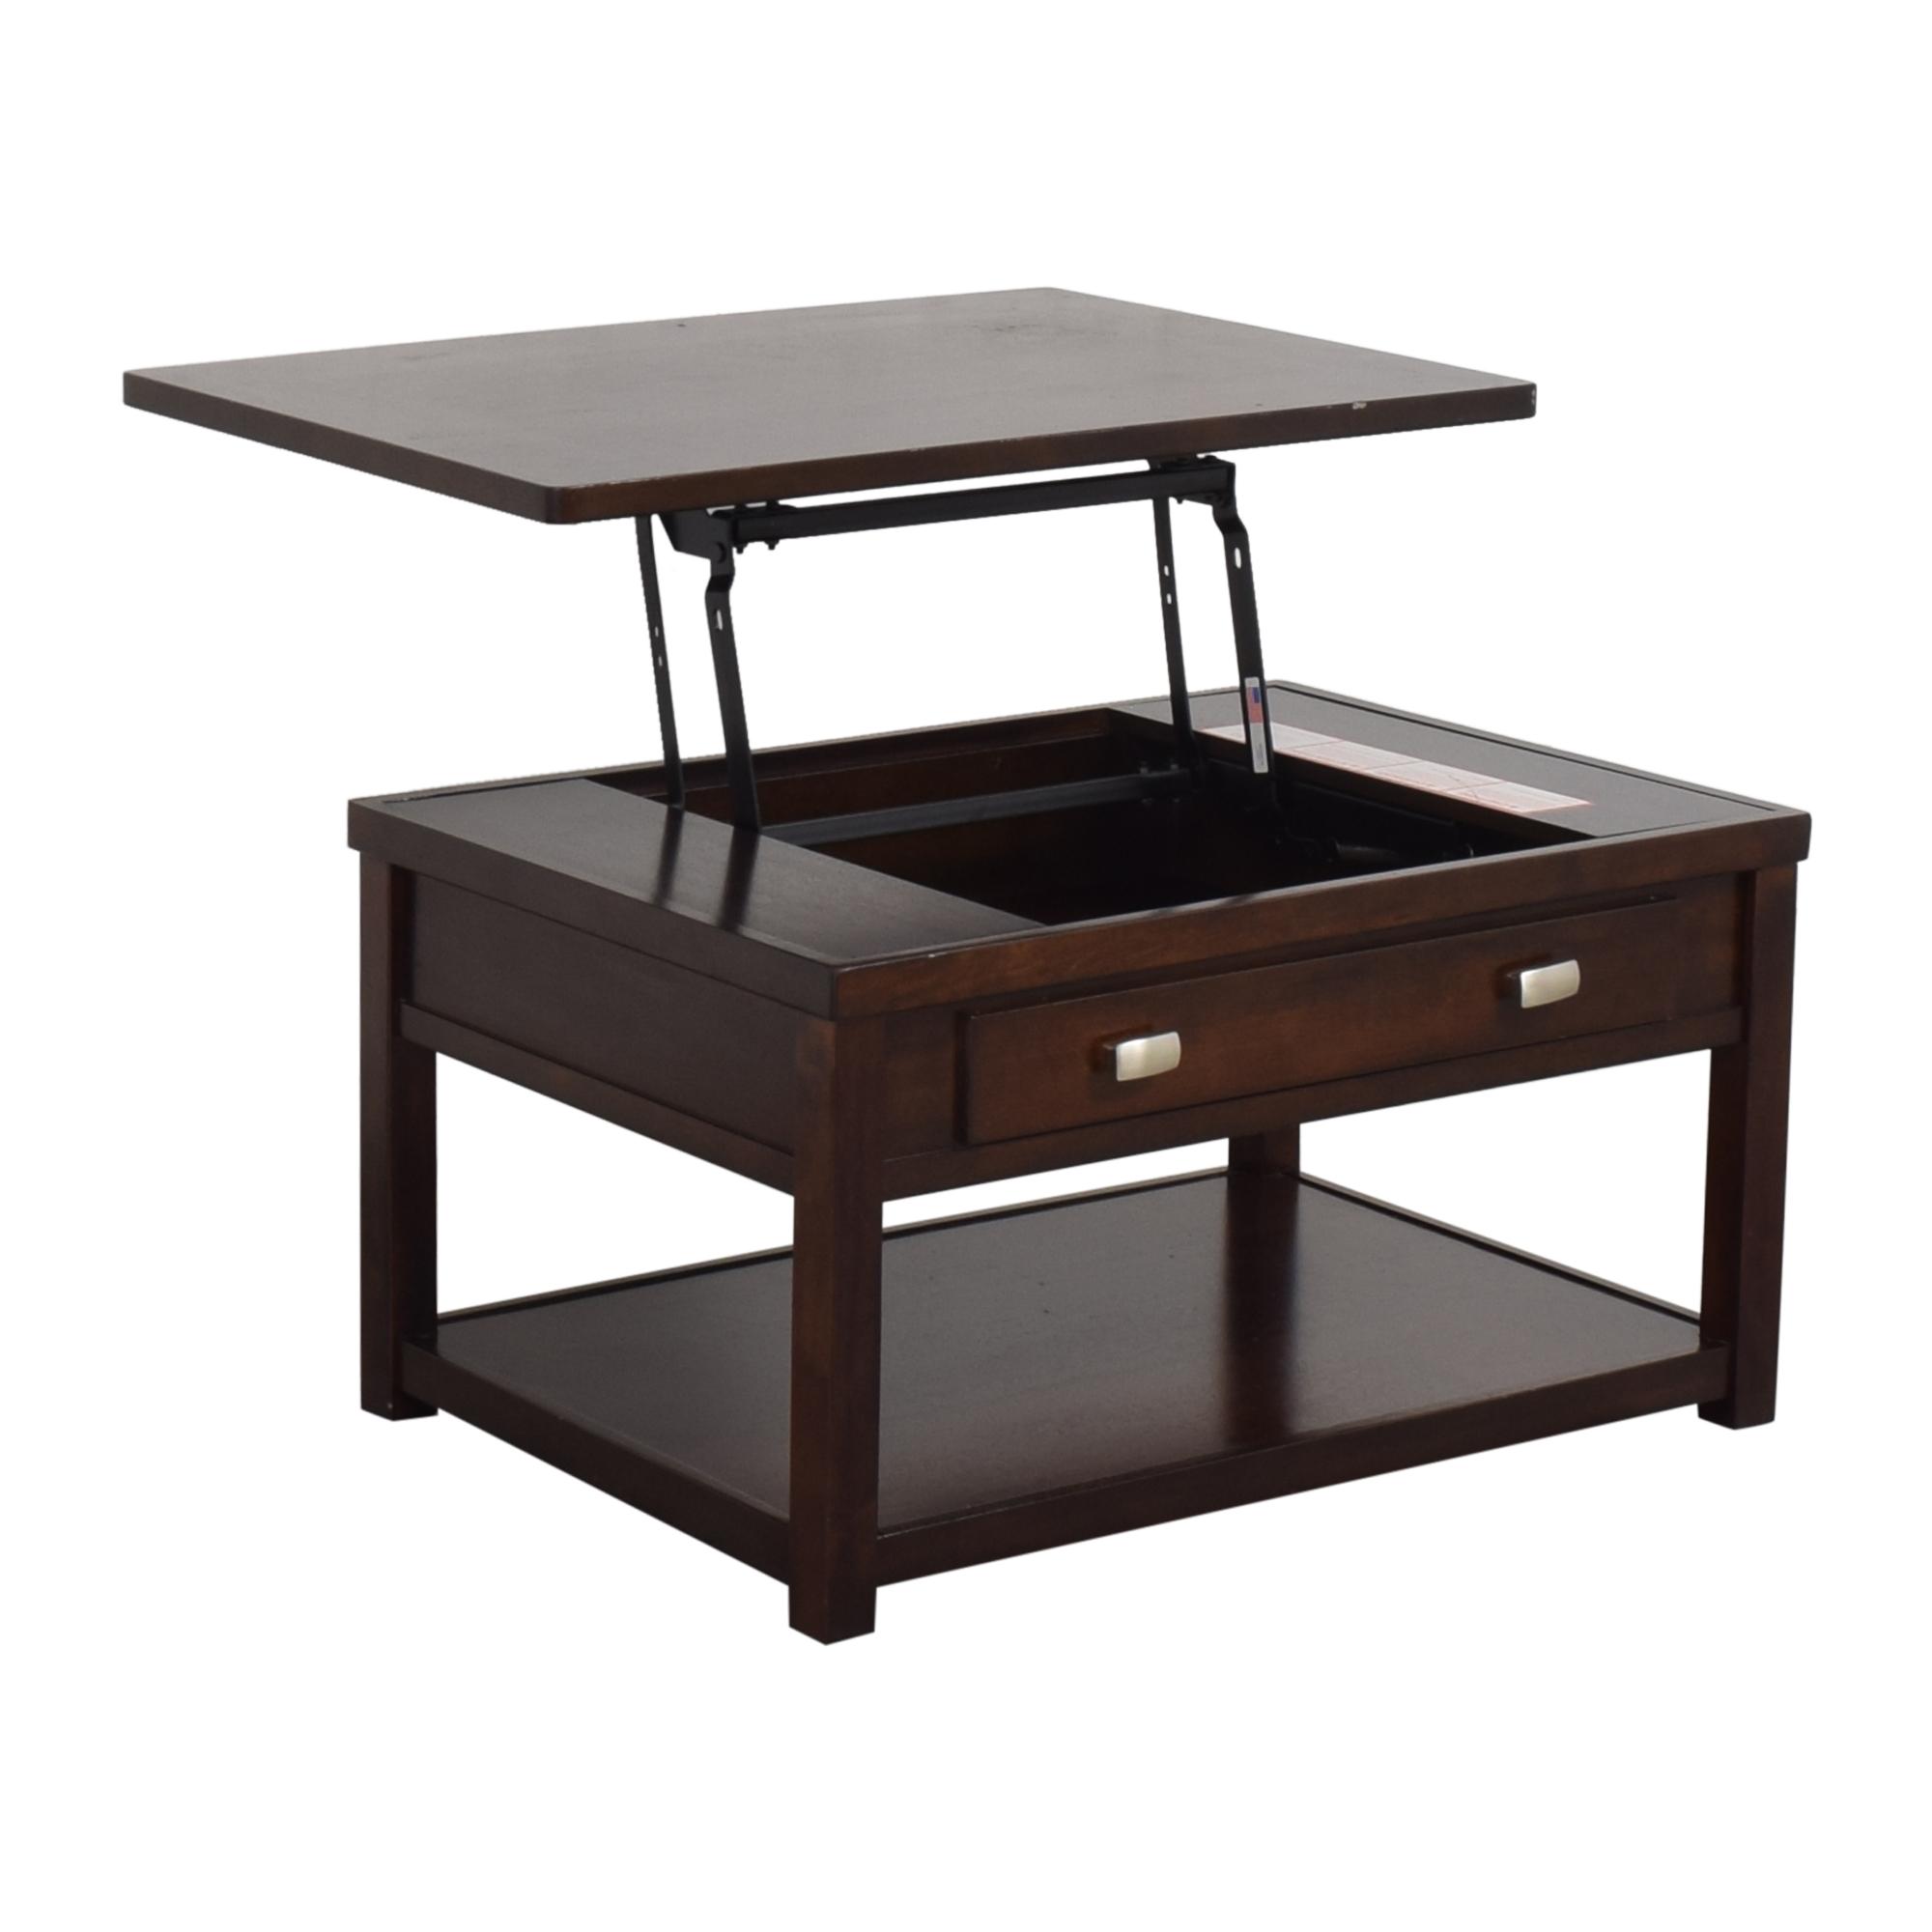 Ashley Furniture Ashley Furniture Hatsuko Lift Top Cocktail Table